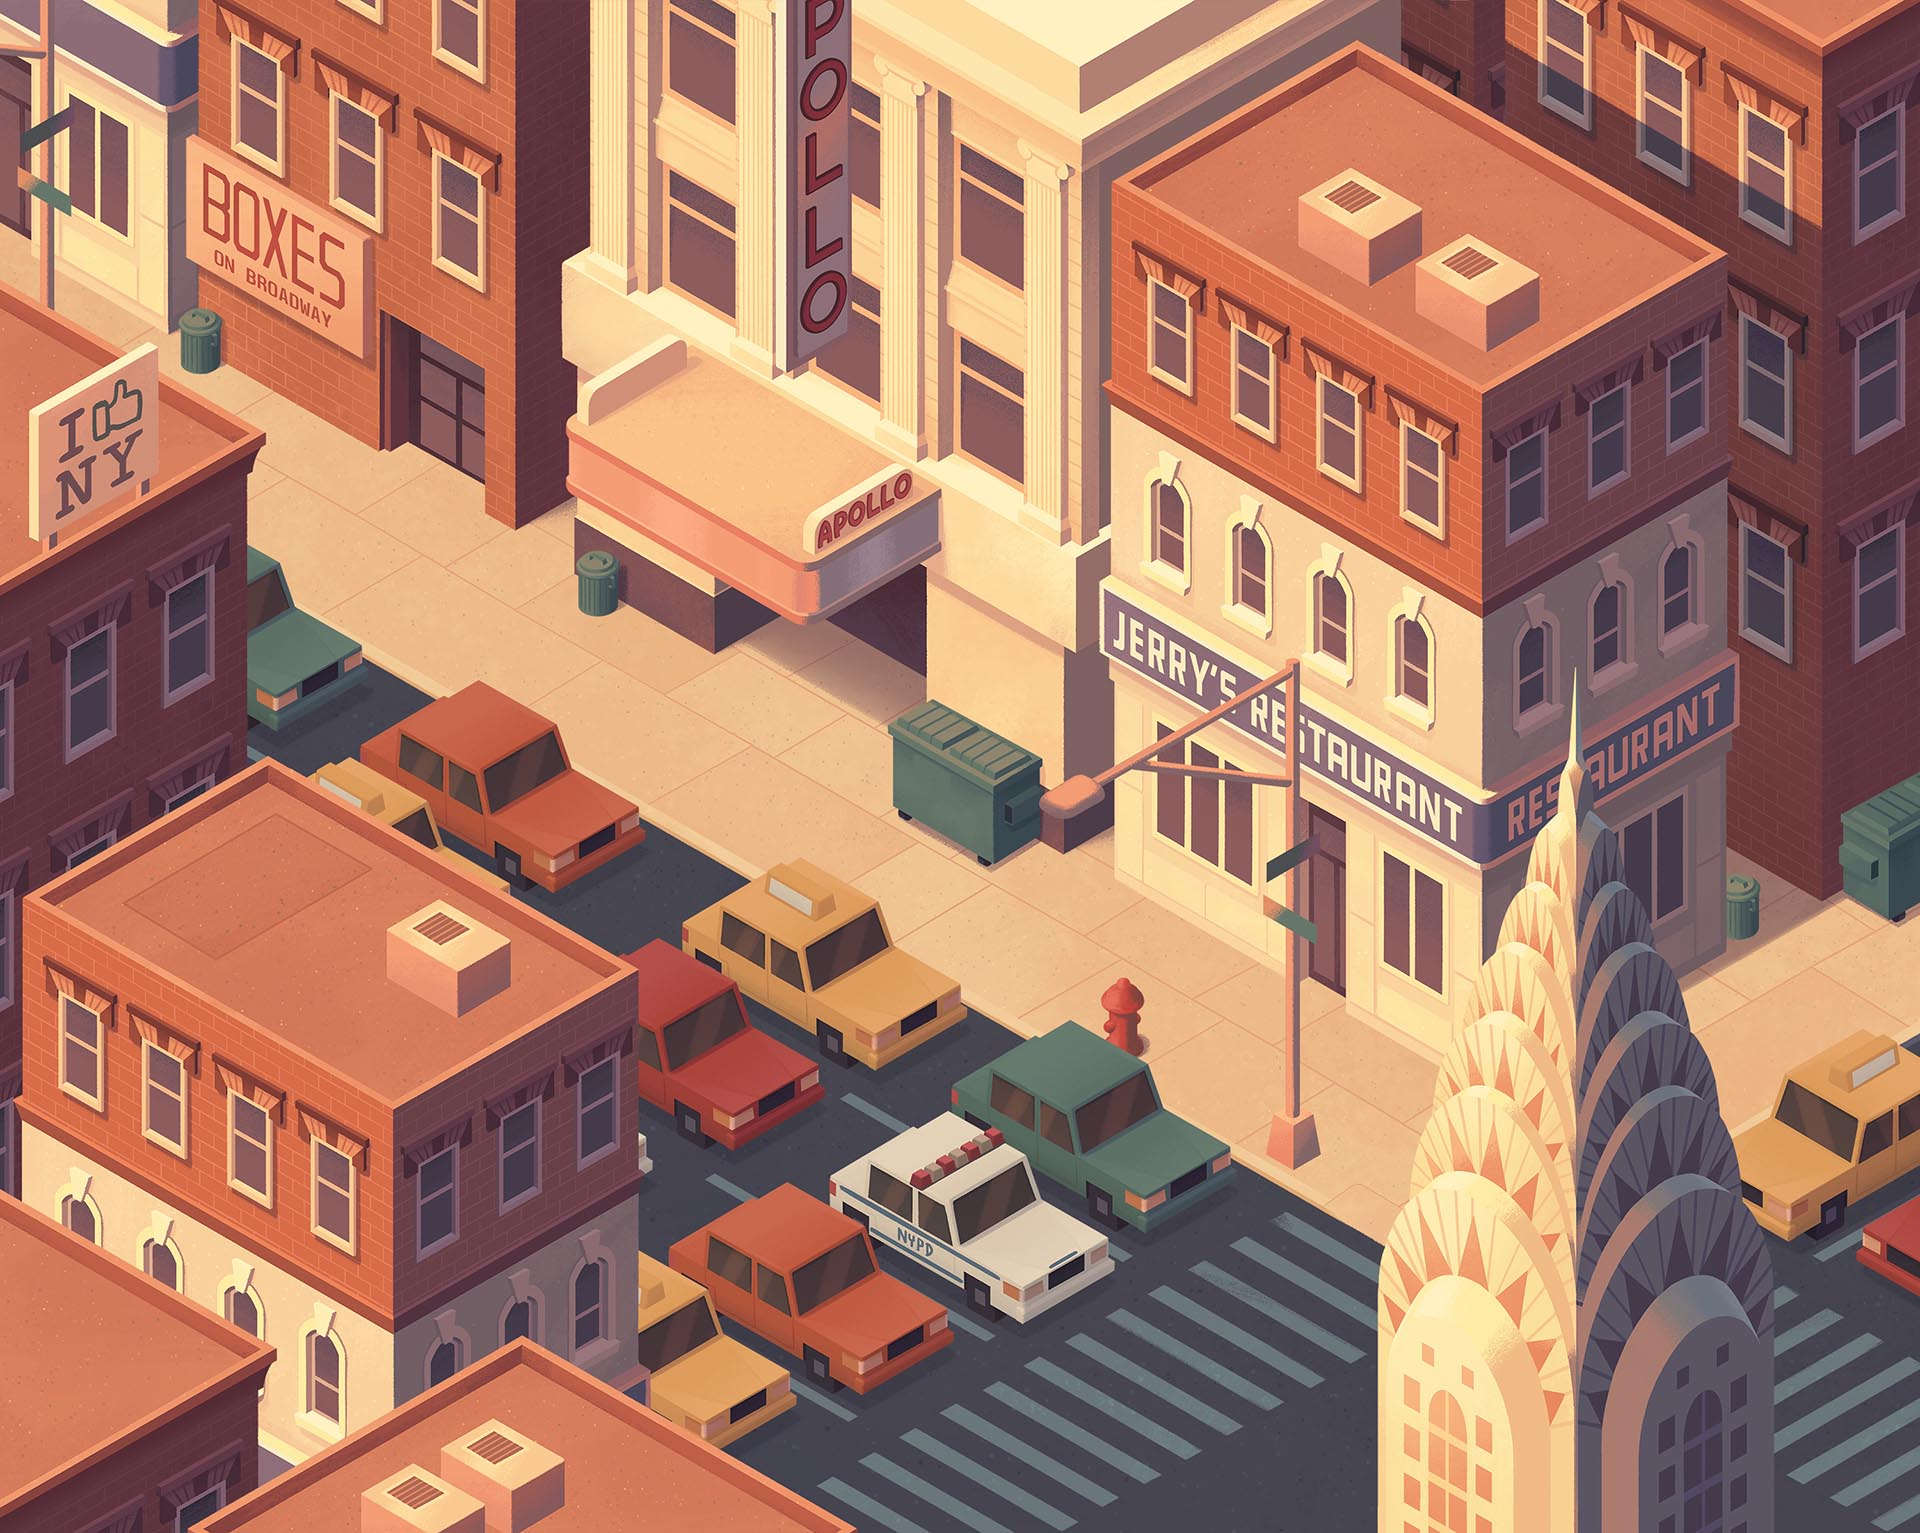 BackgroundArtnet Background Art for Animation 1920x1533